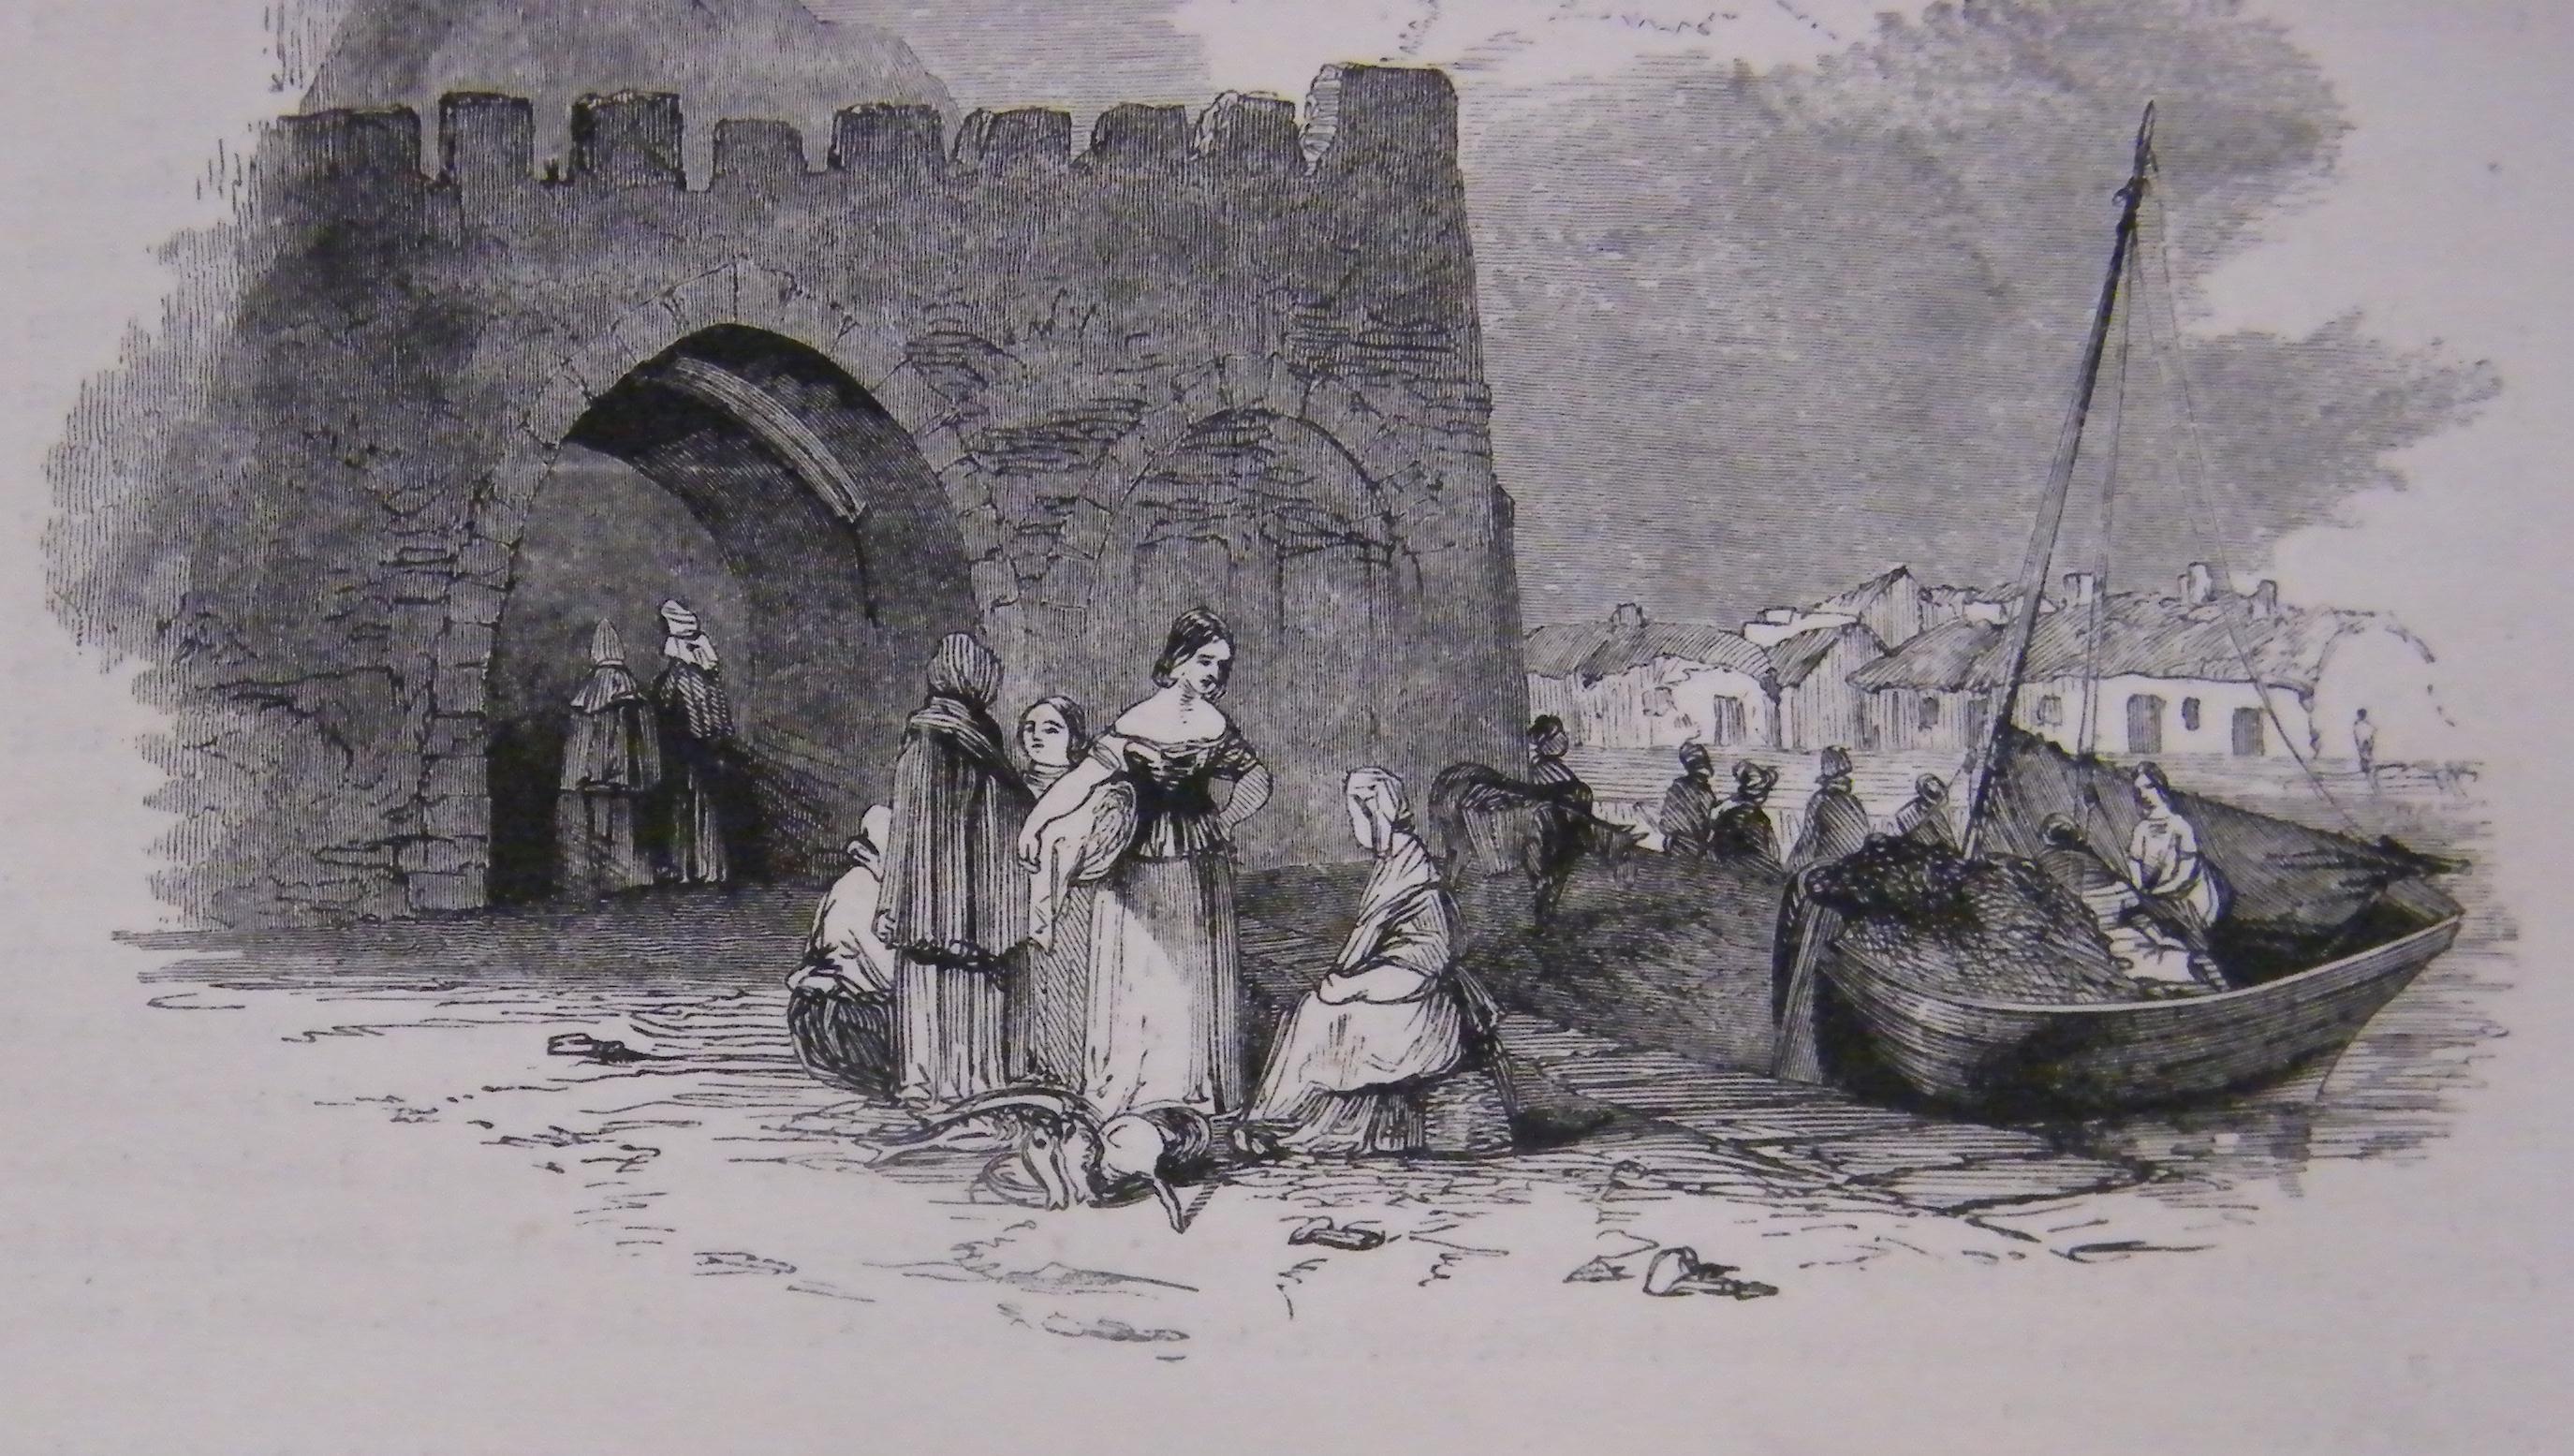 1843: Hall's Claddagh | Perceptions of Galway & the Claddagh